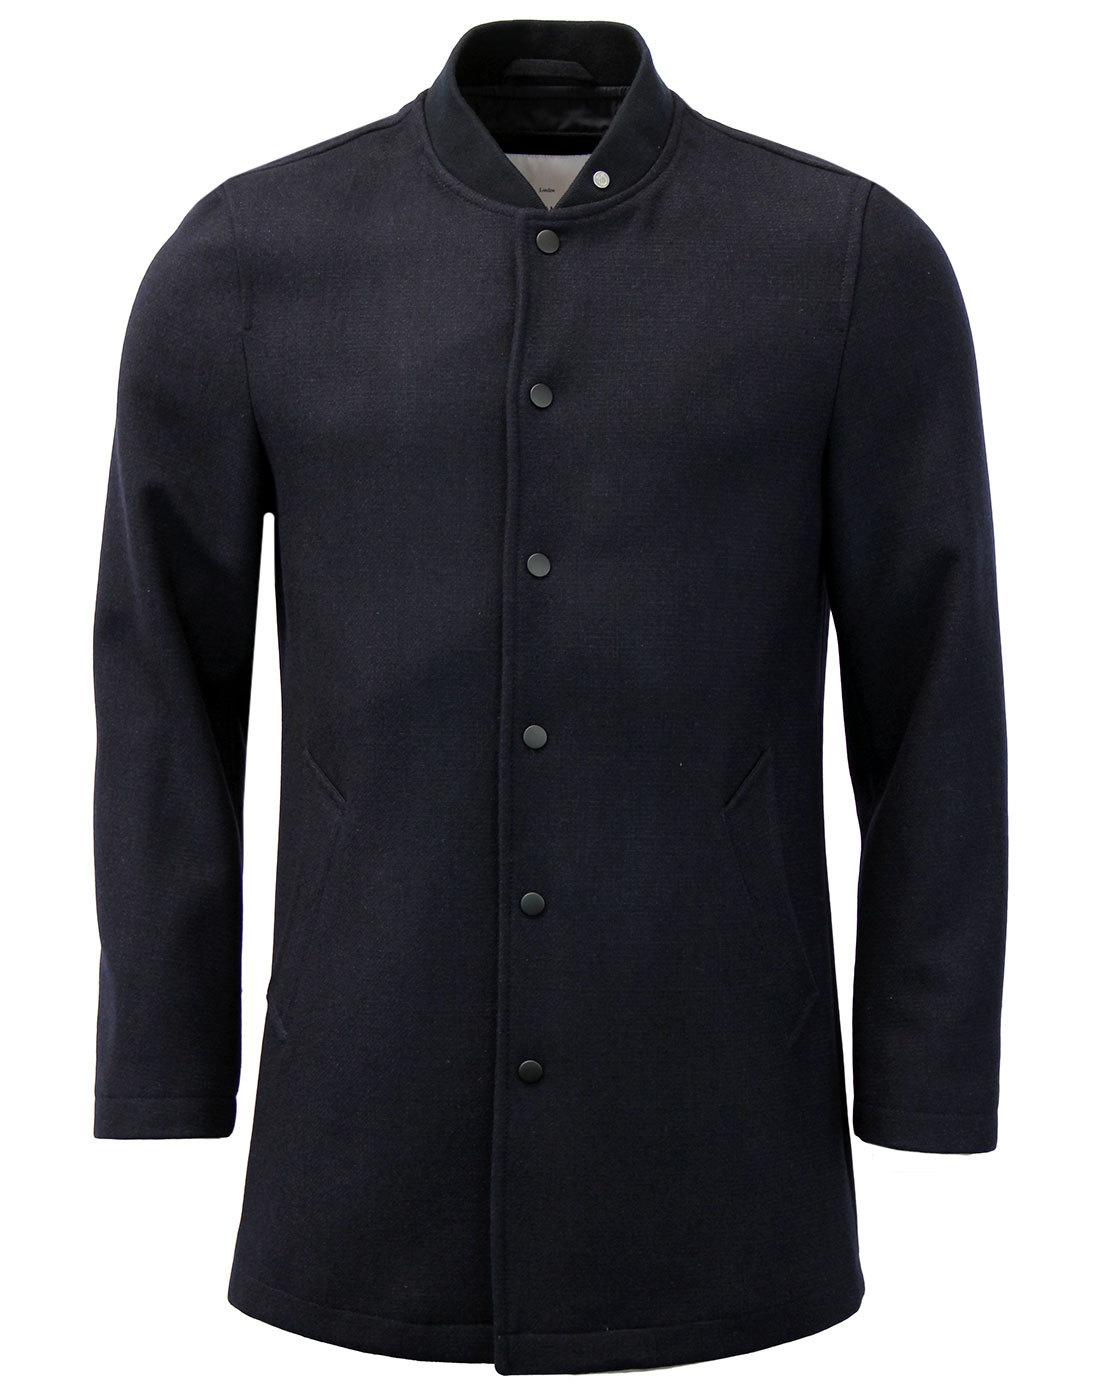 Target PETER WERTH Mod Wool Longline Bomber Jacket